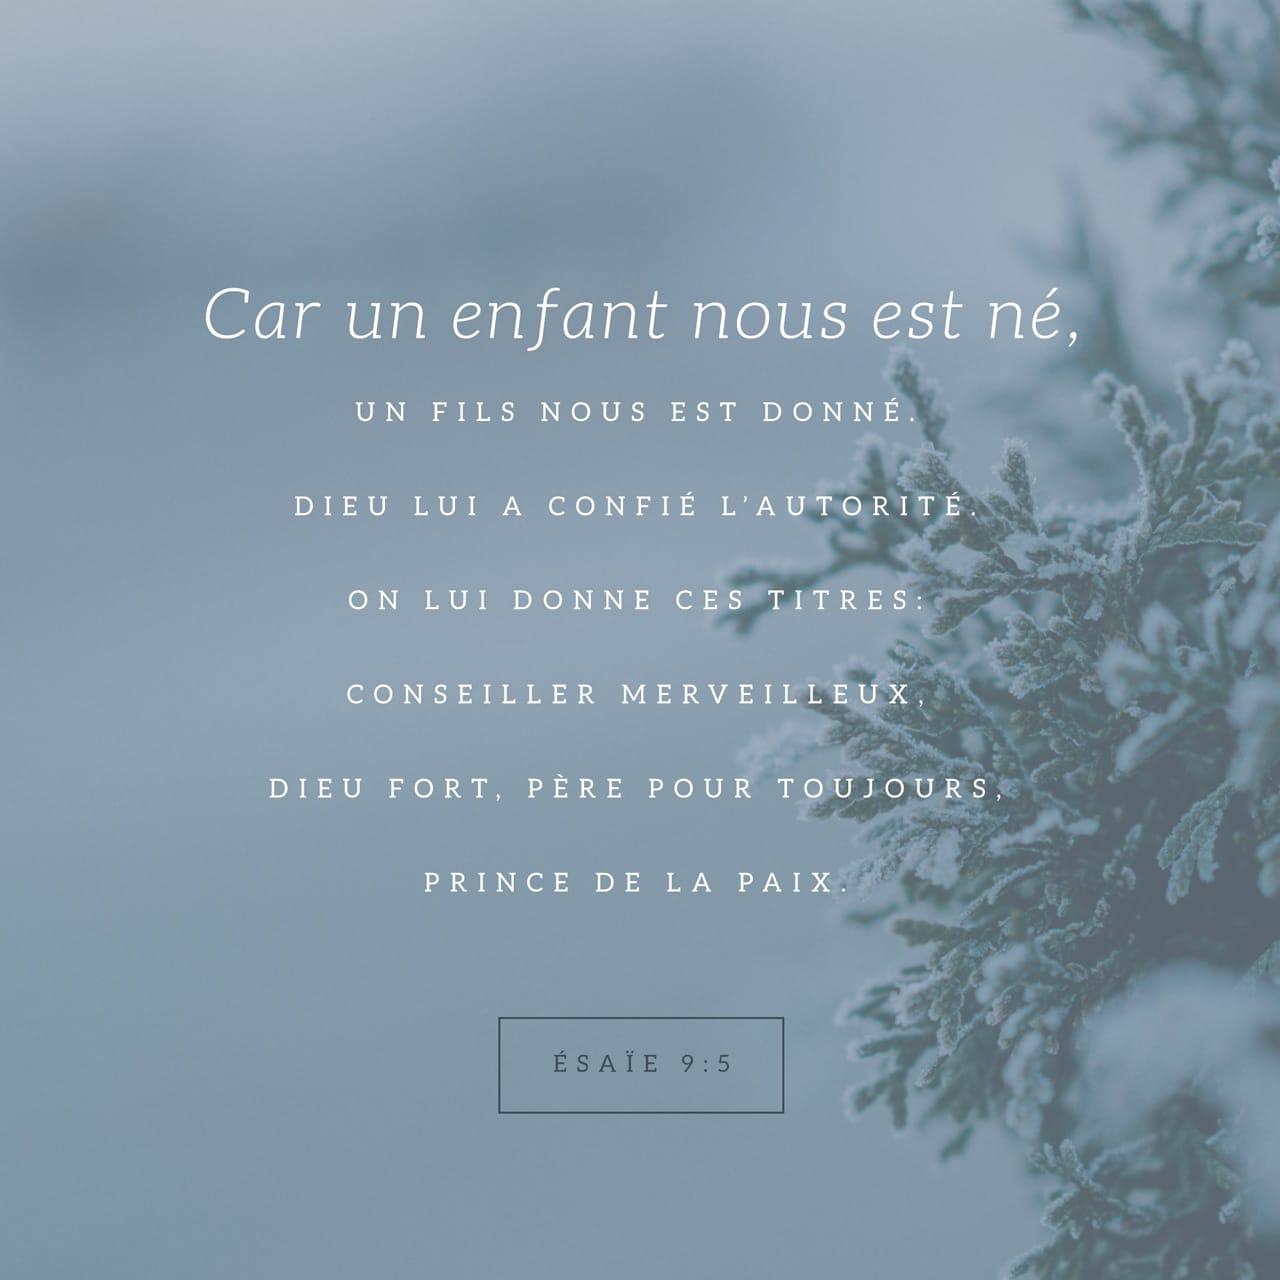 Verset Illustré - Esaïe 9:6